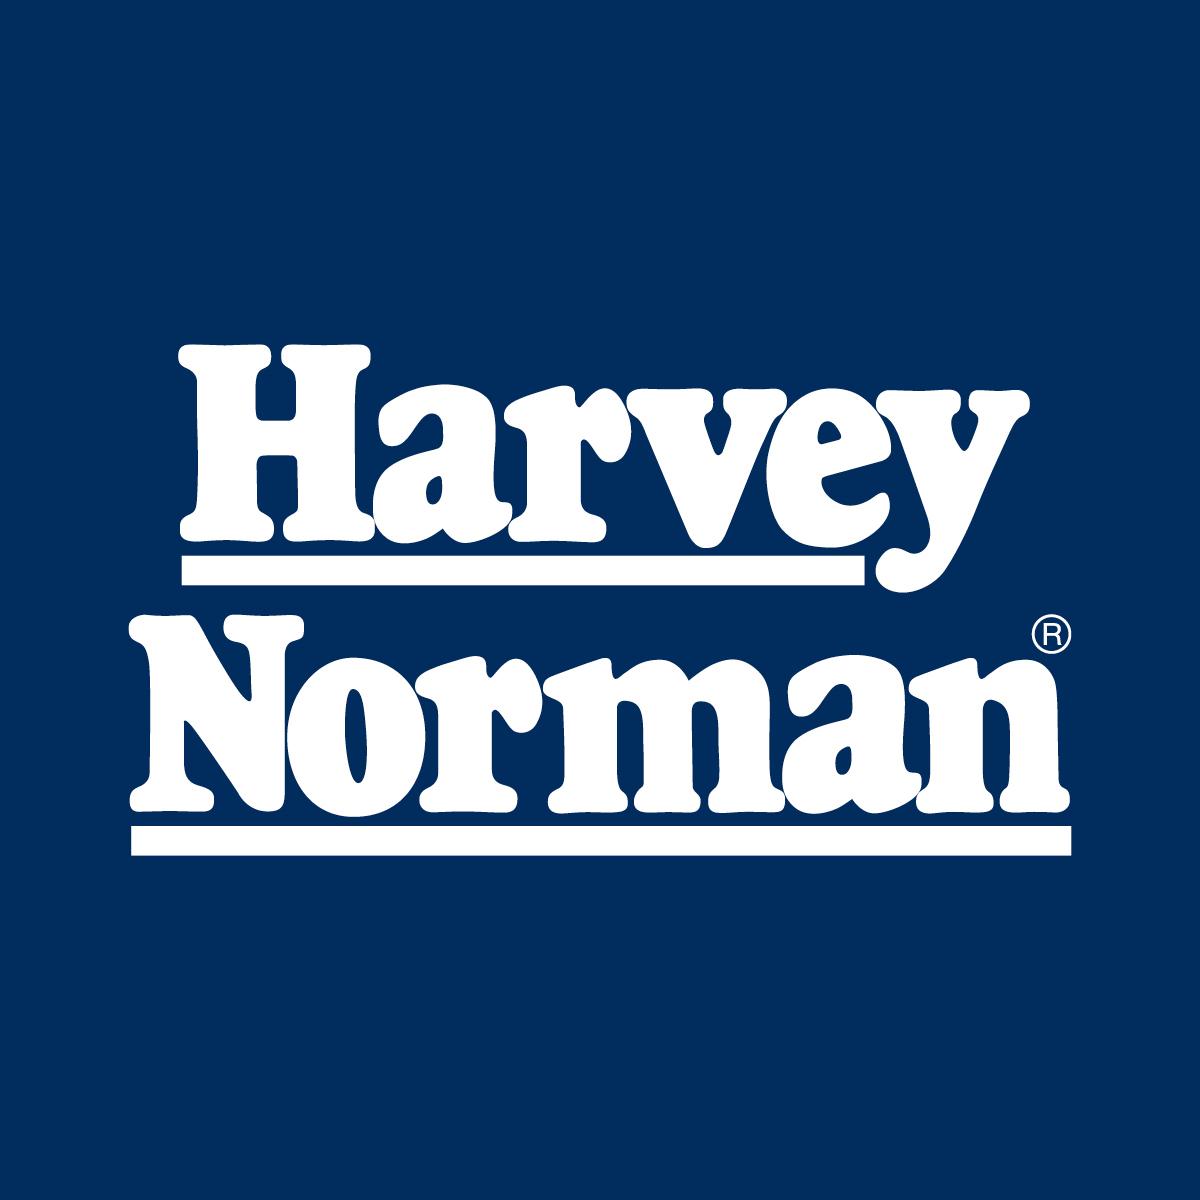 Harvey Norman opening hours